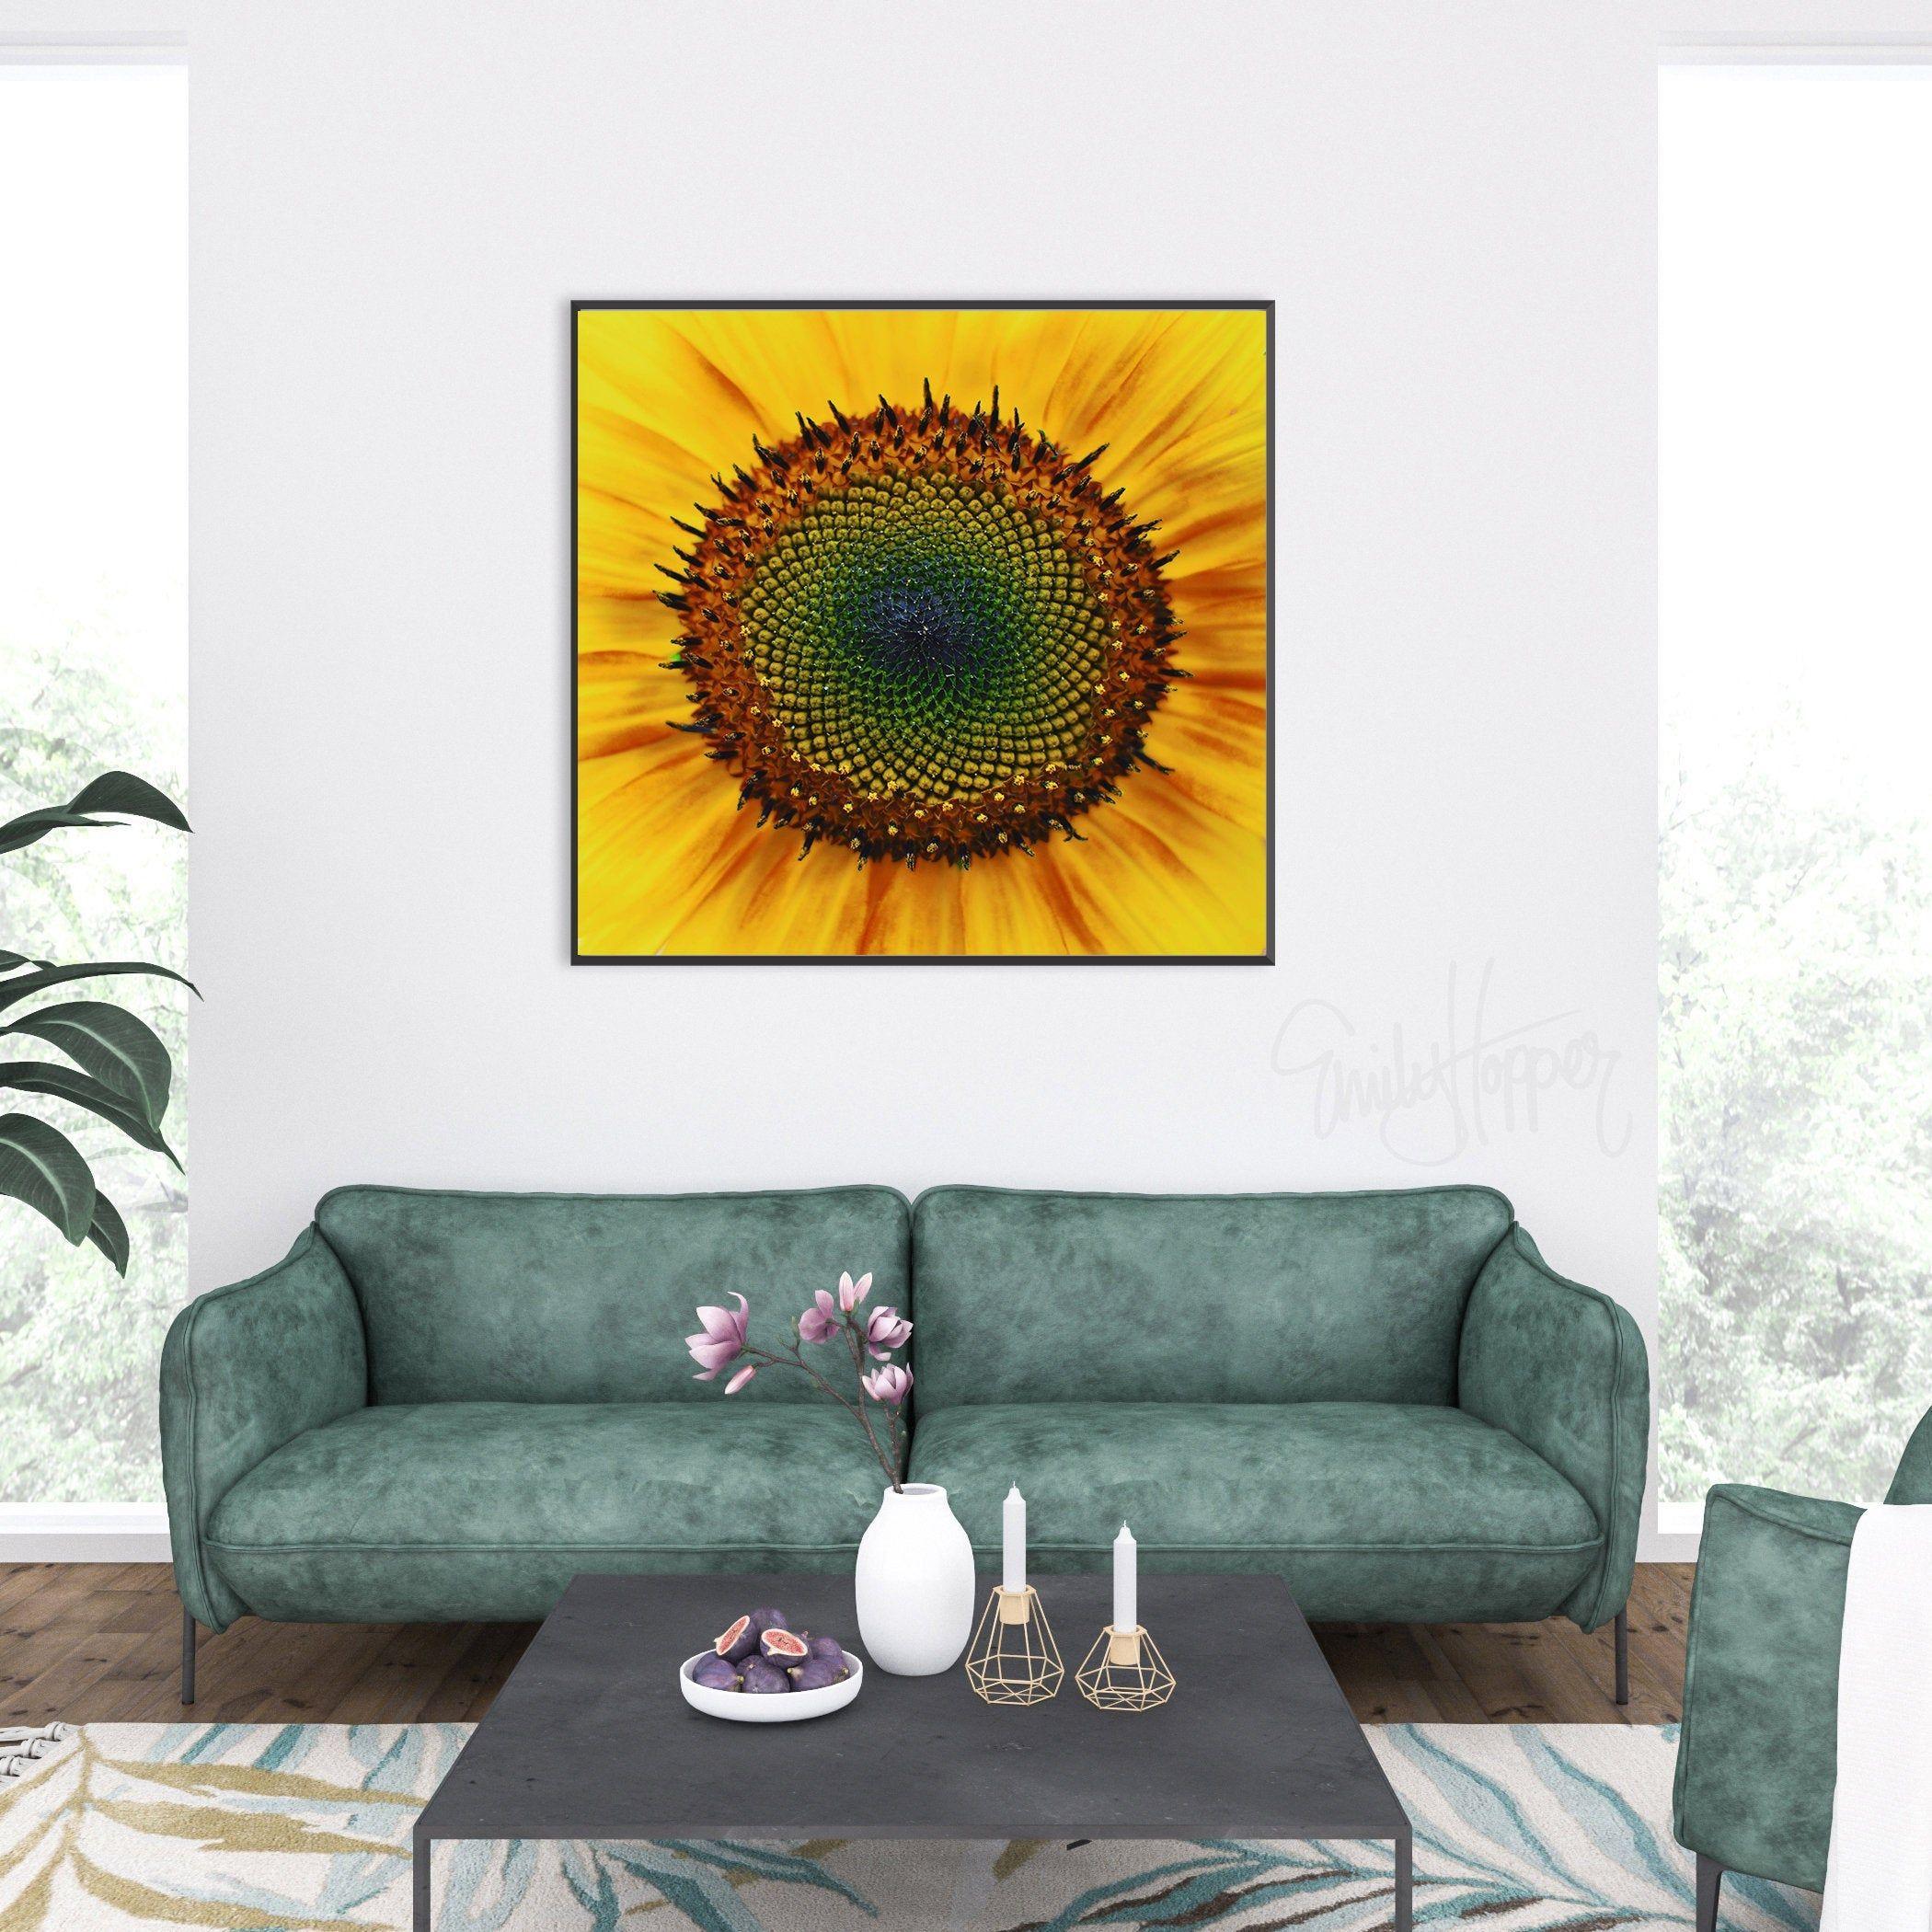 Sunflower Decor Fine Art Photography Print Yellow Sunflower Wall Art Living Room Bedroom K In 2020 Living Room Art Wall Art Living Room Photography Prints Art #sunflower #themed #living #room